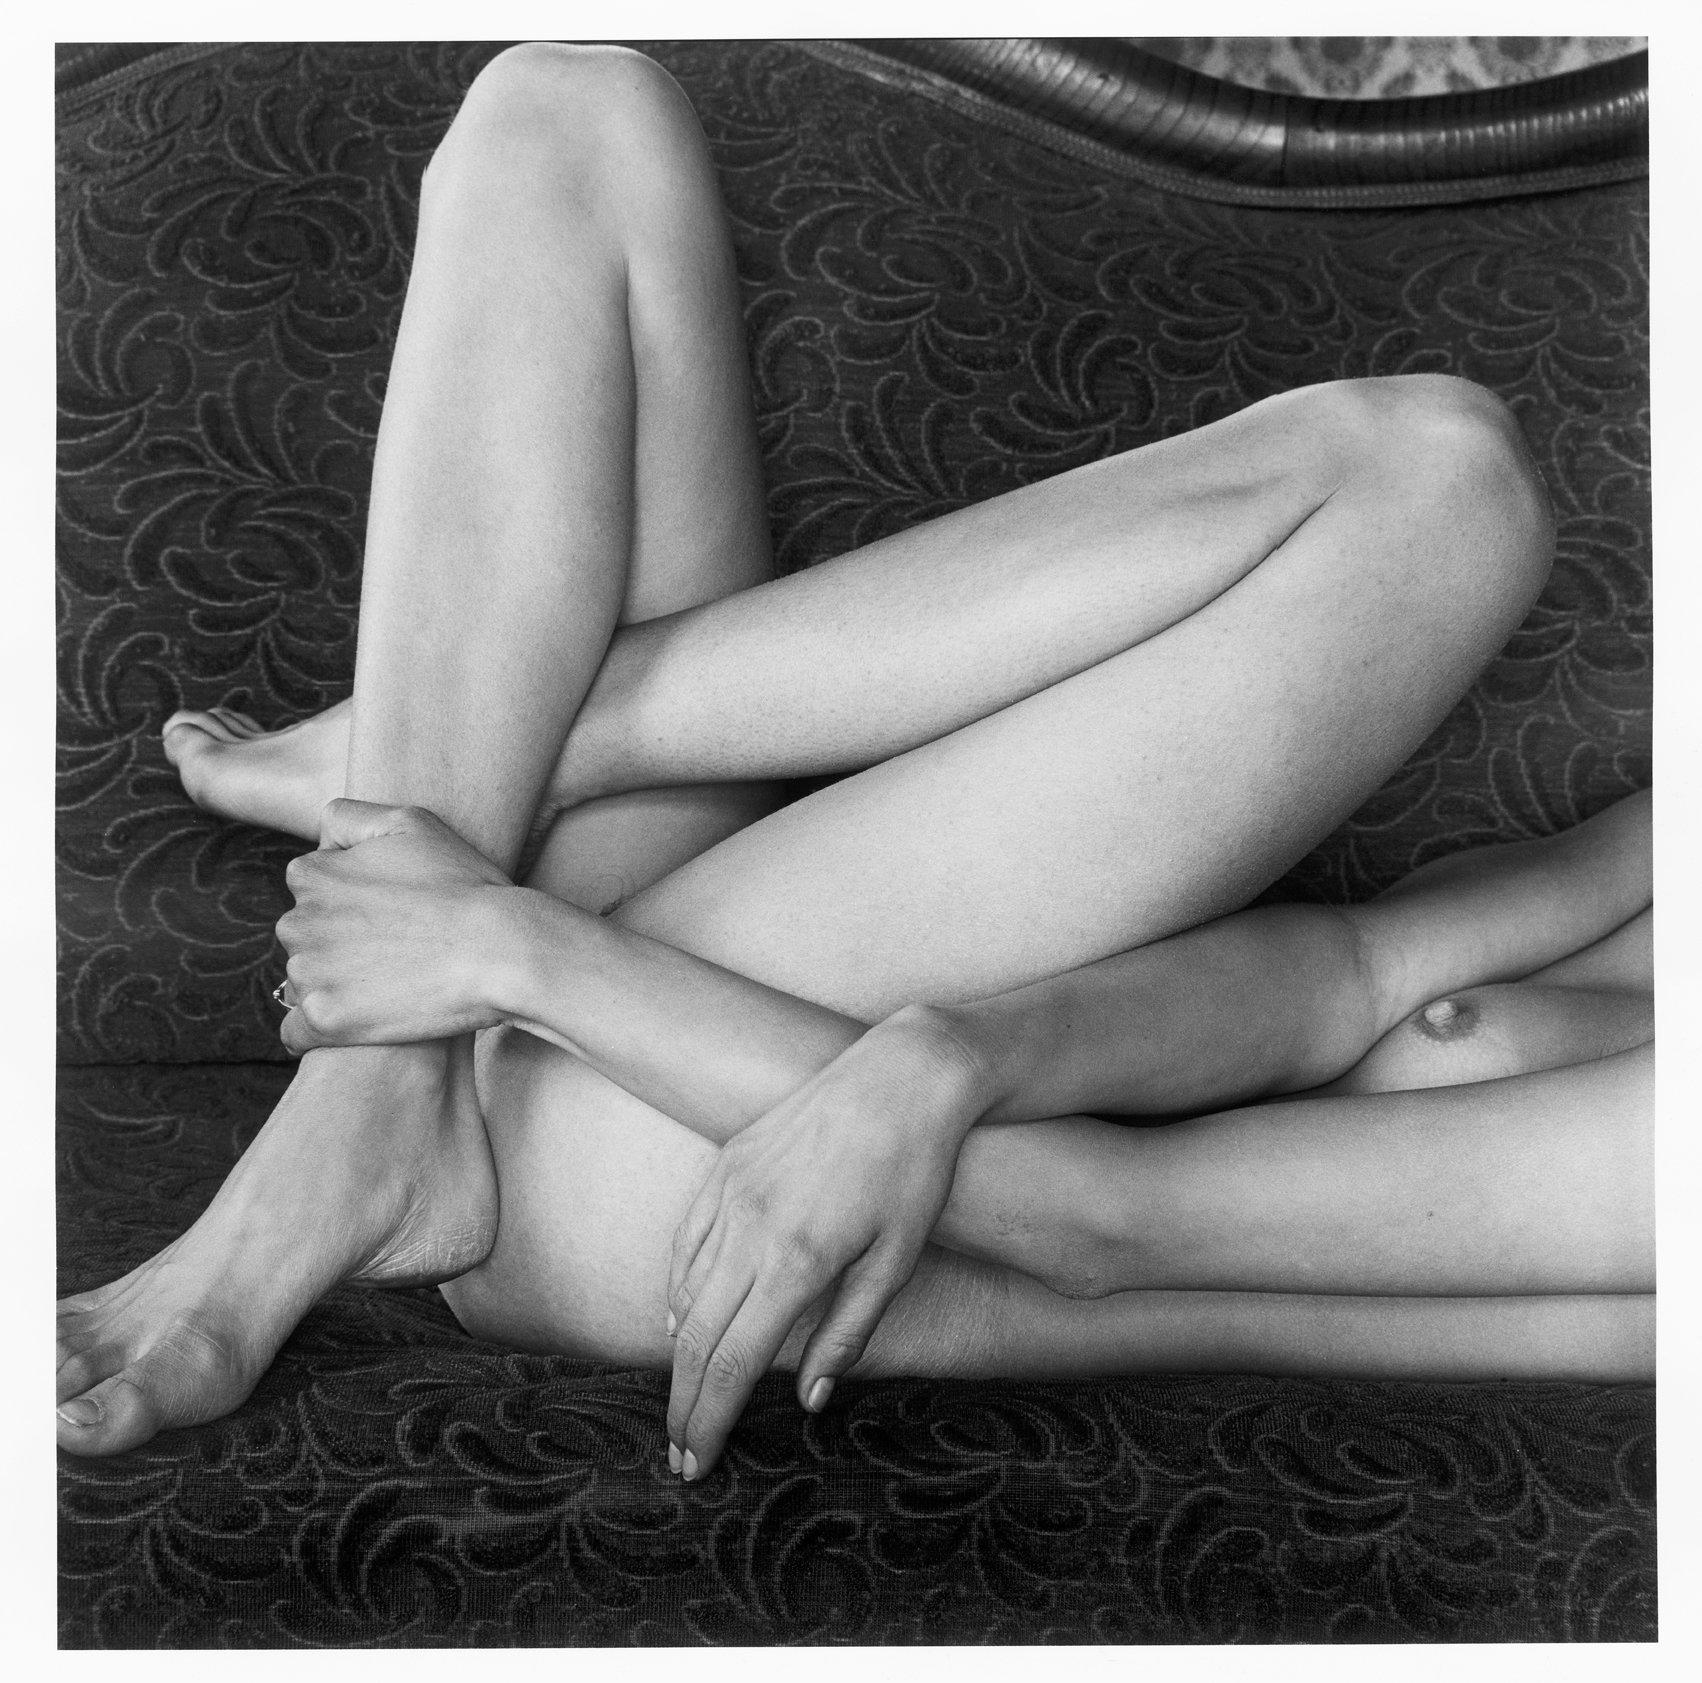 Entwining, 1981 © Rutger Ten Broeke